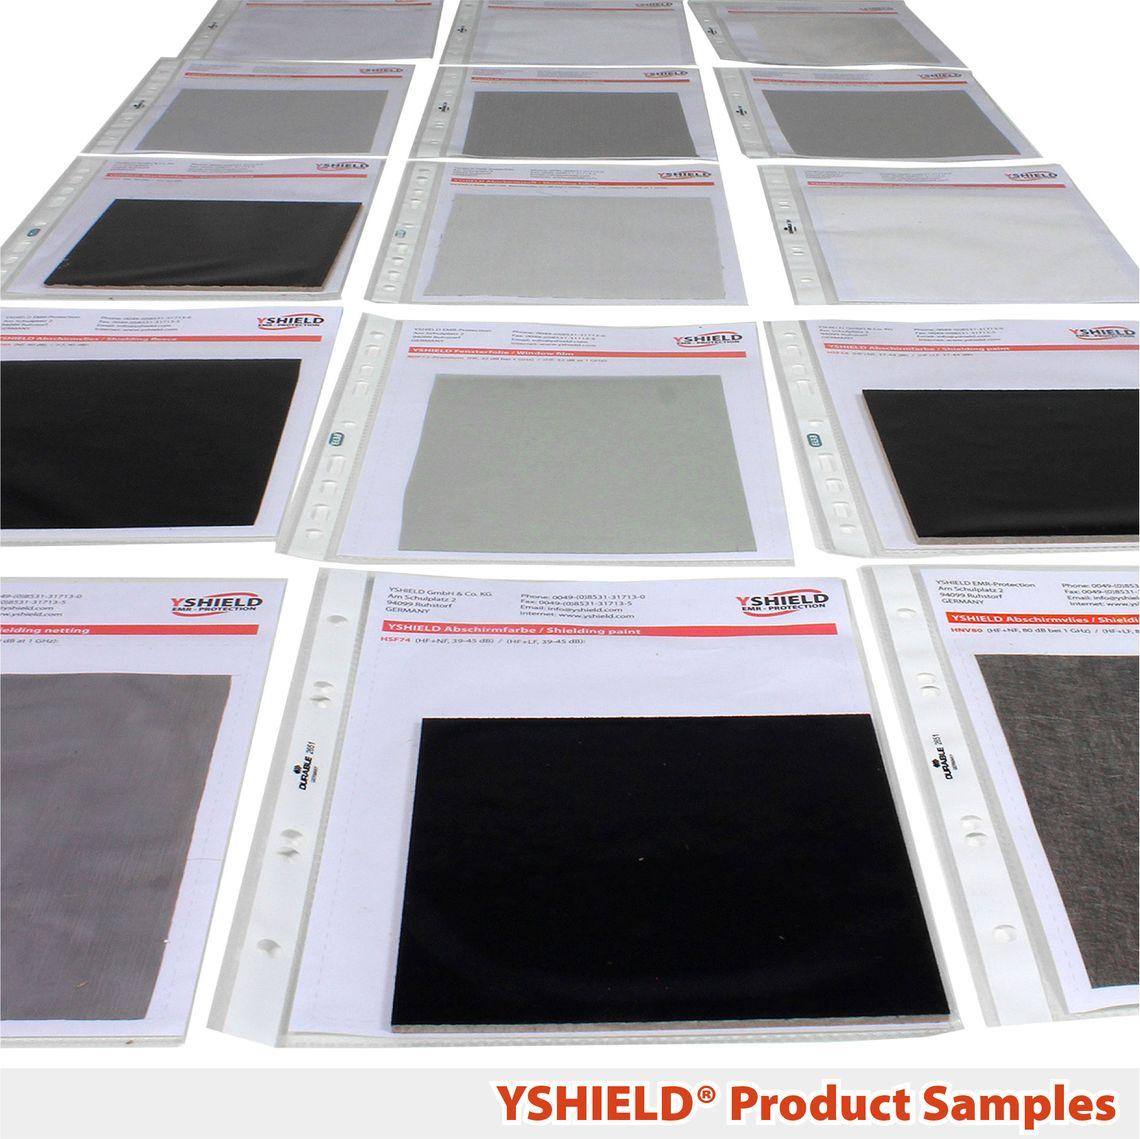 Sample sheets DIN A5